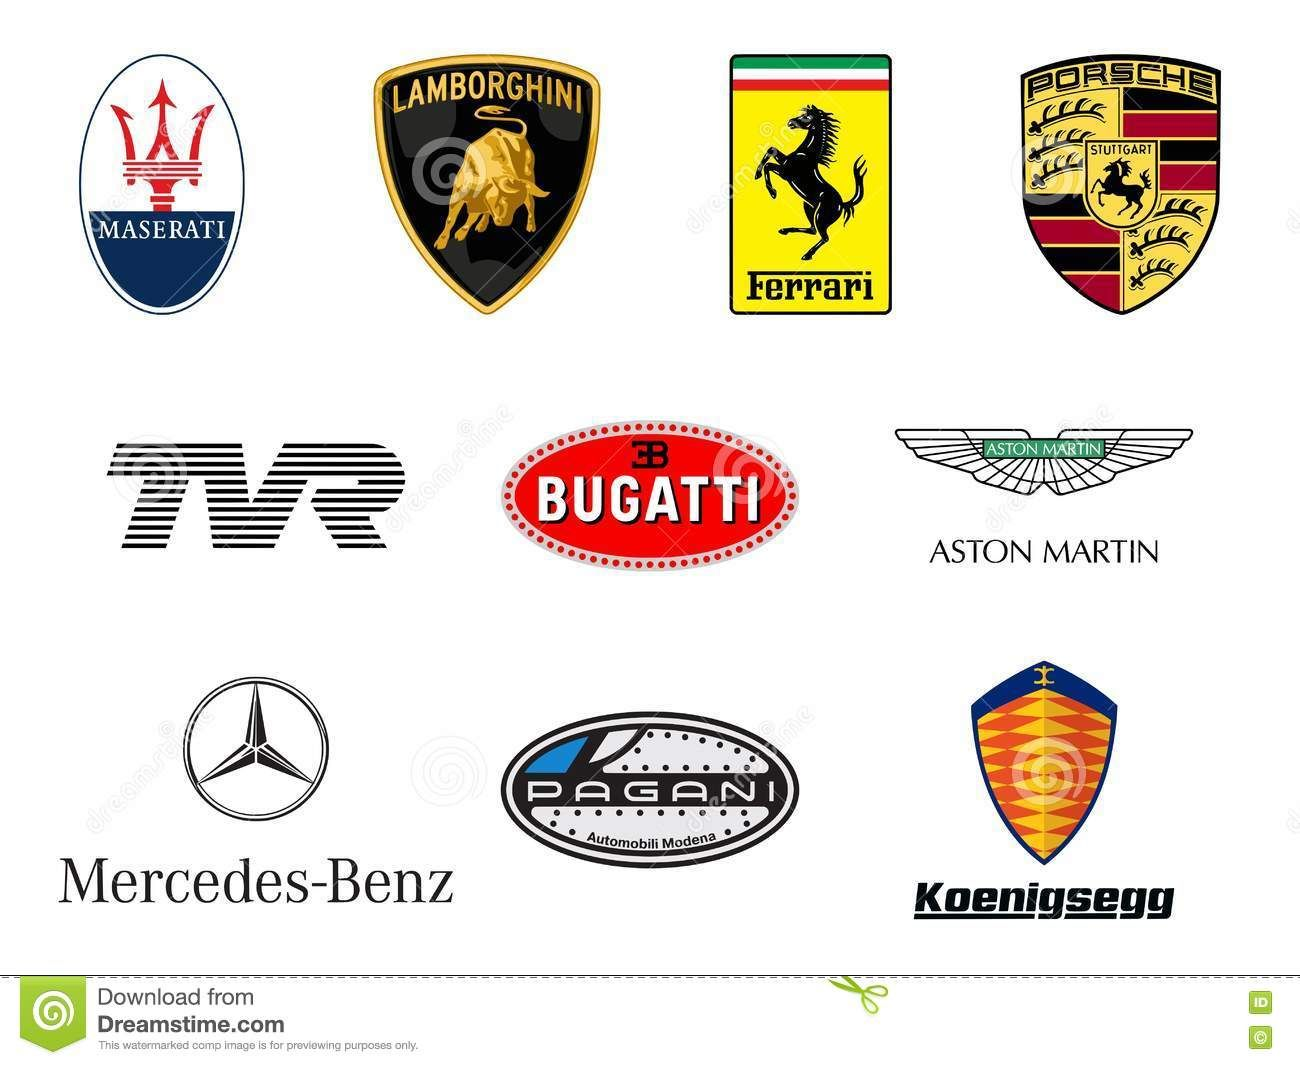 Noggin Cbeebies Car Logos Google Search Car Logos Logos Sport Cars